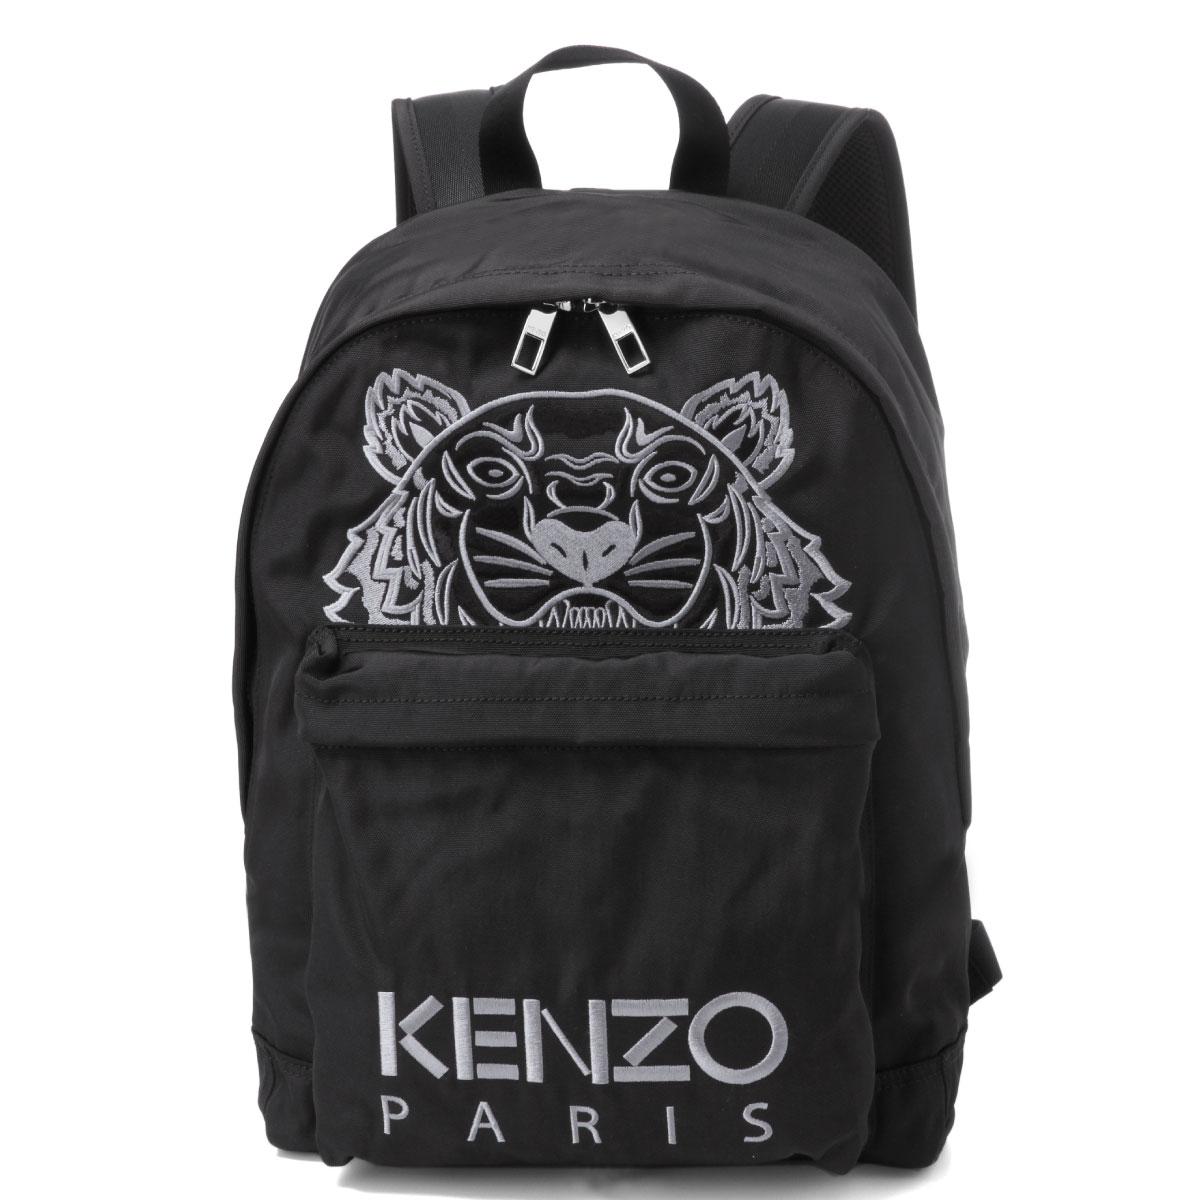 85938131e93 importshopdouble: Kenzo KENZO bag lady 5SF300F20 99 backpack large ...